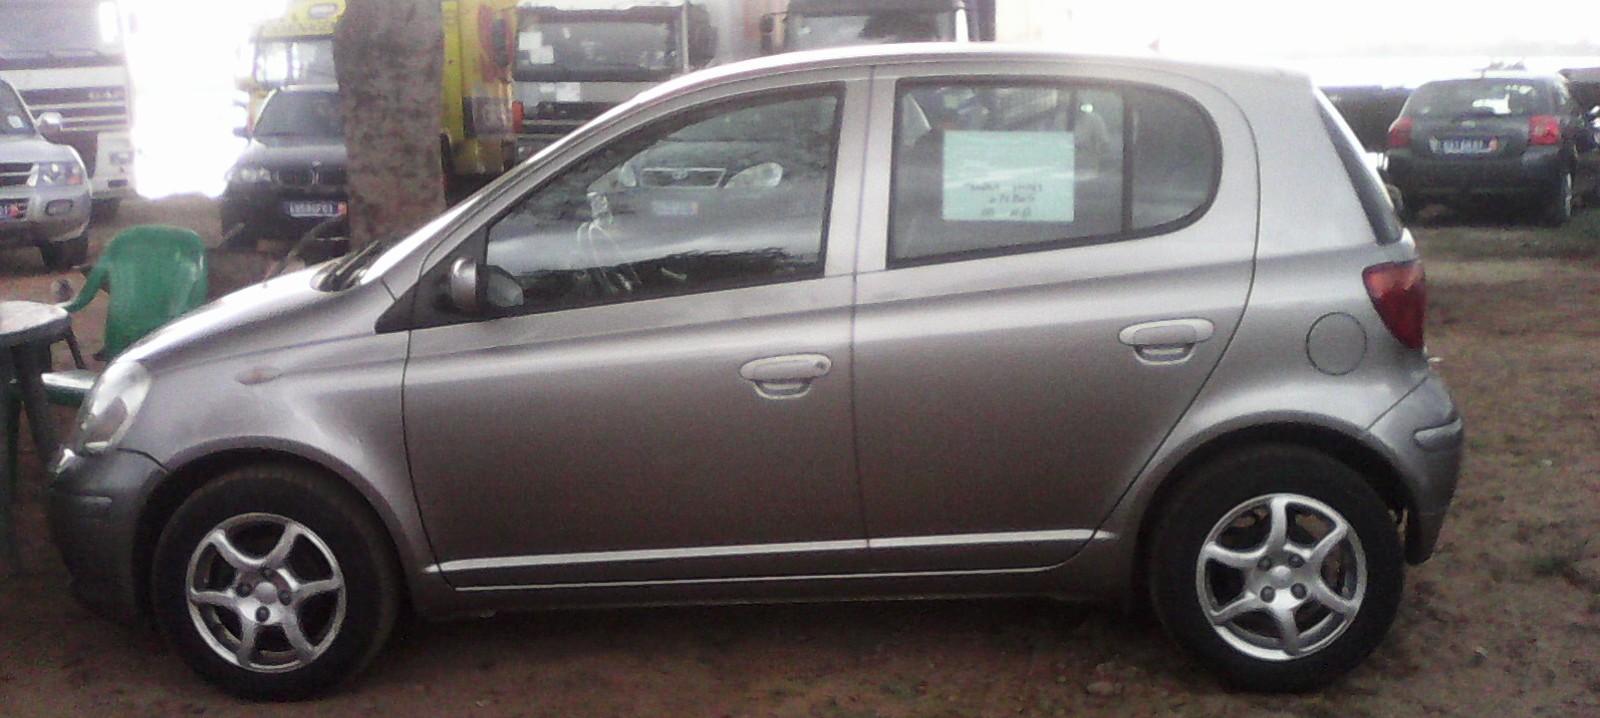 Vente Toyota Yaris--Abidjan